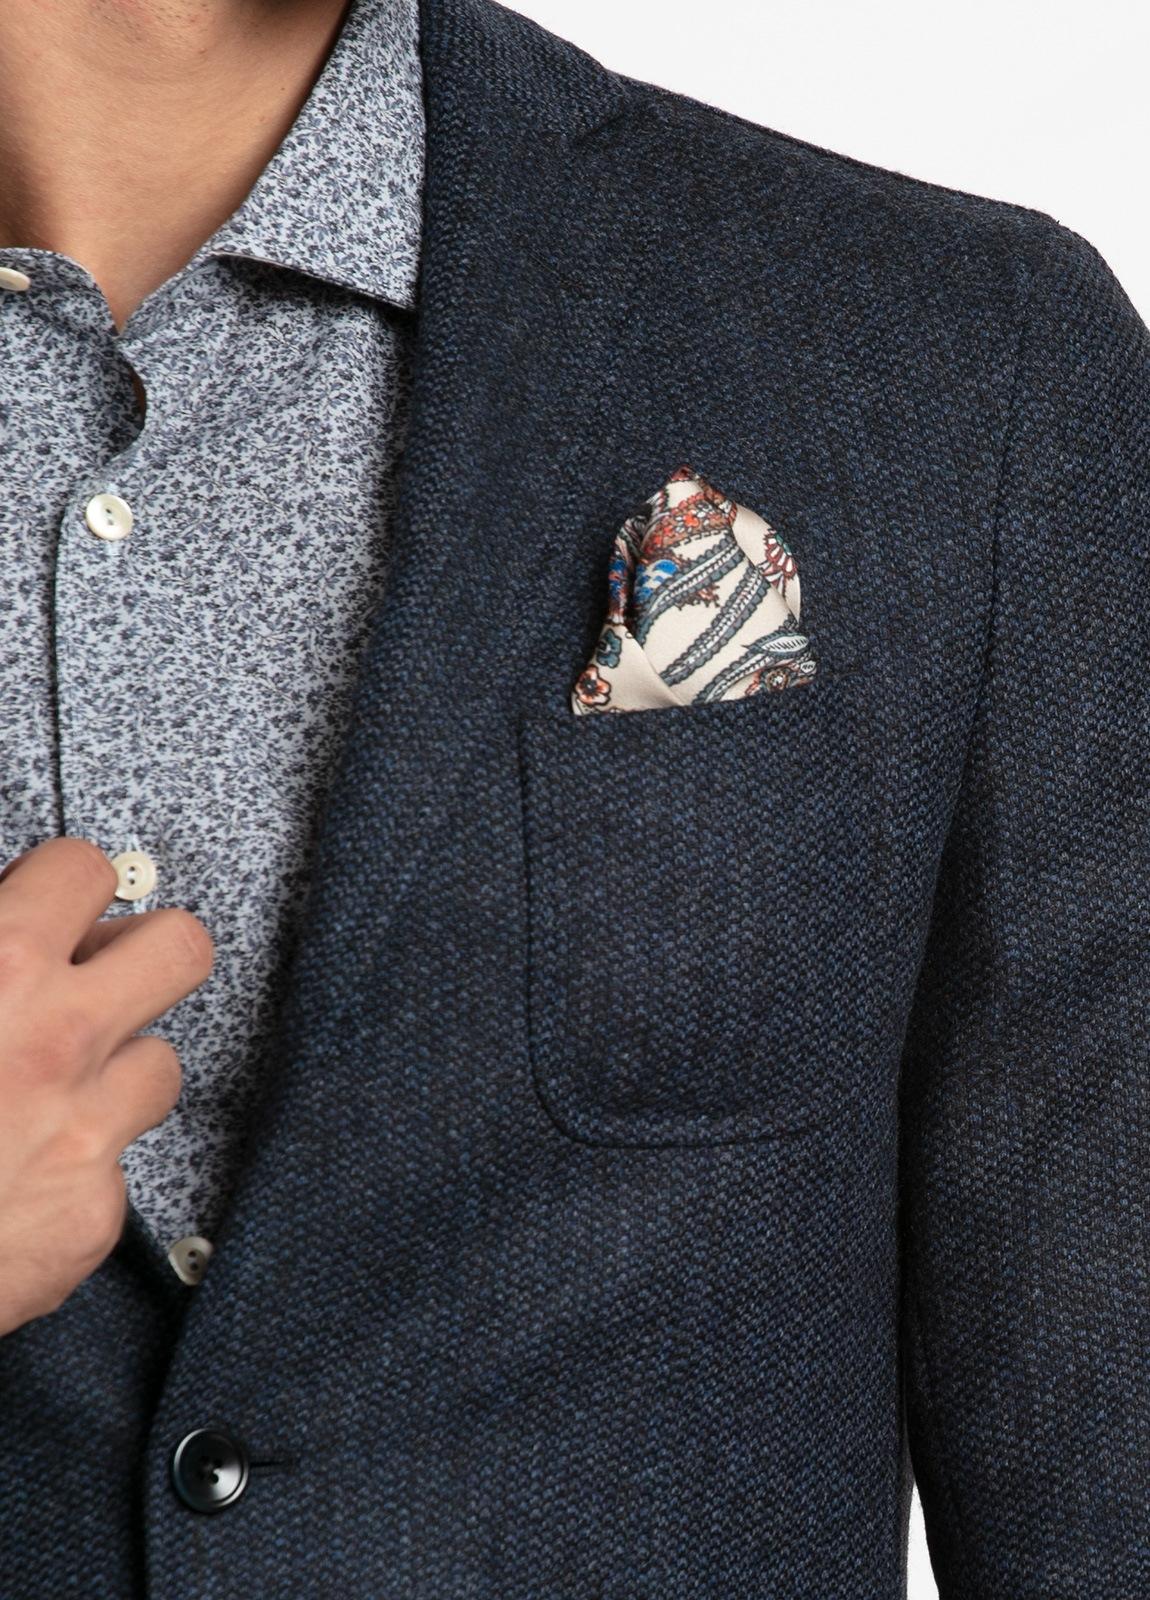 Americana SOFT JACKET Slim Fit, tejido textura color azul oscuro. 97% Lana, 3% Cashmere. - Ítem4